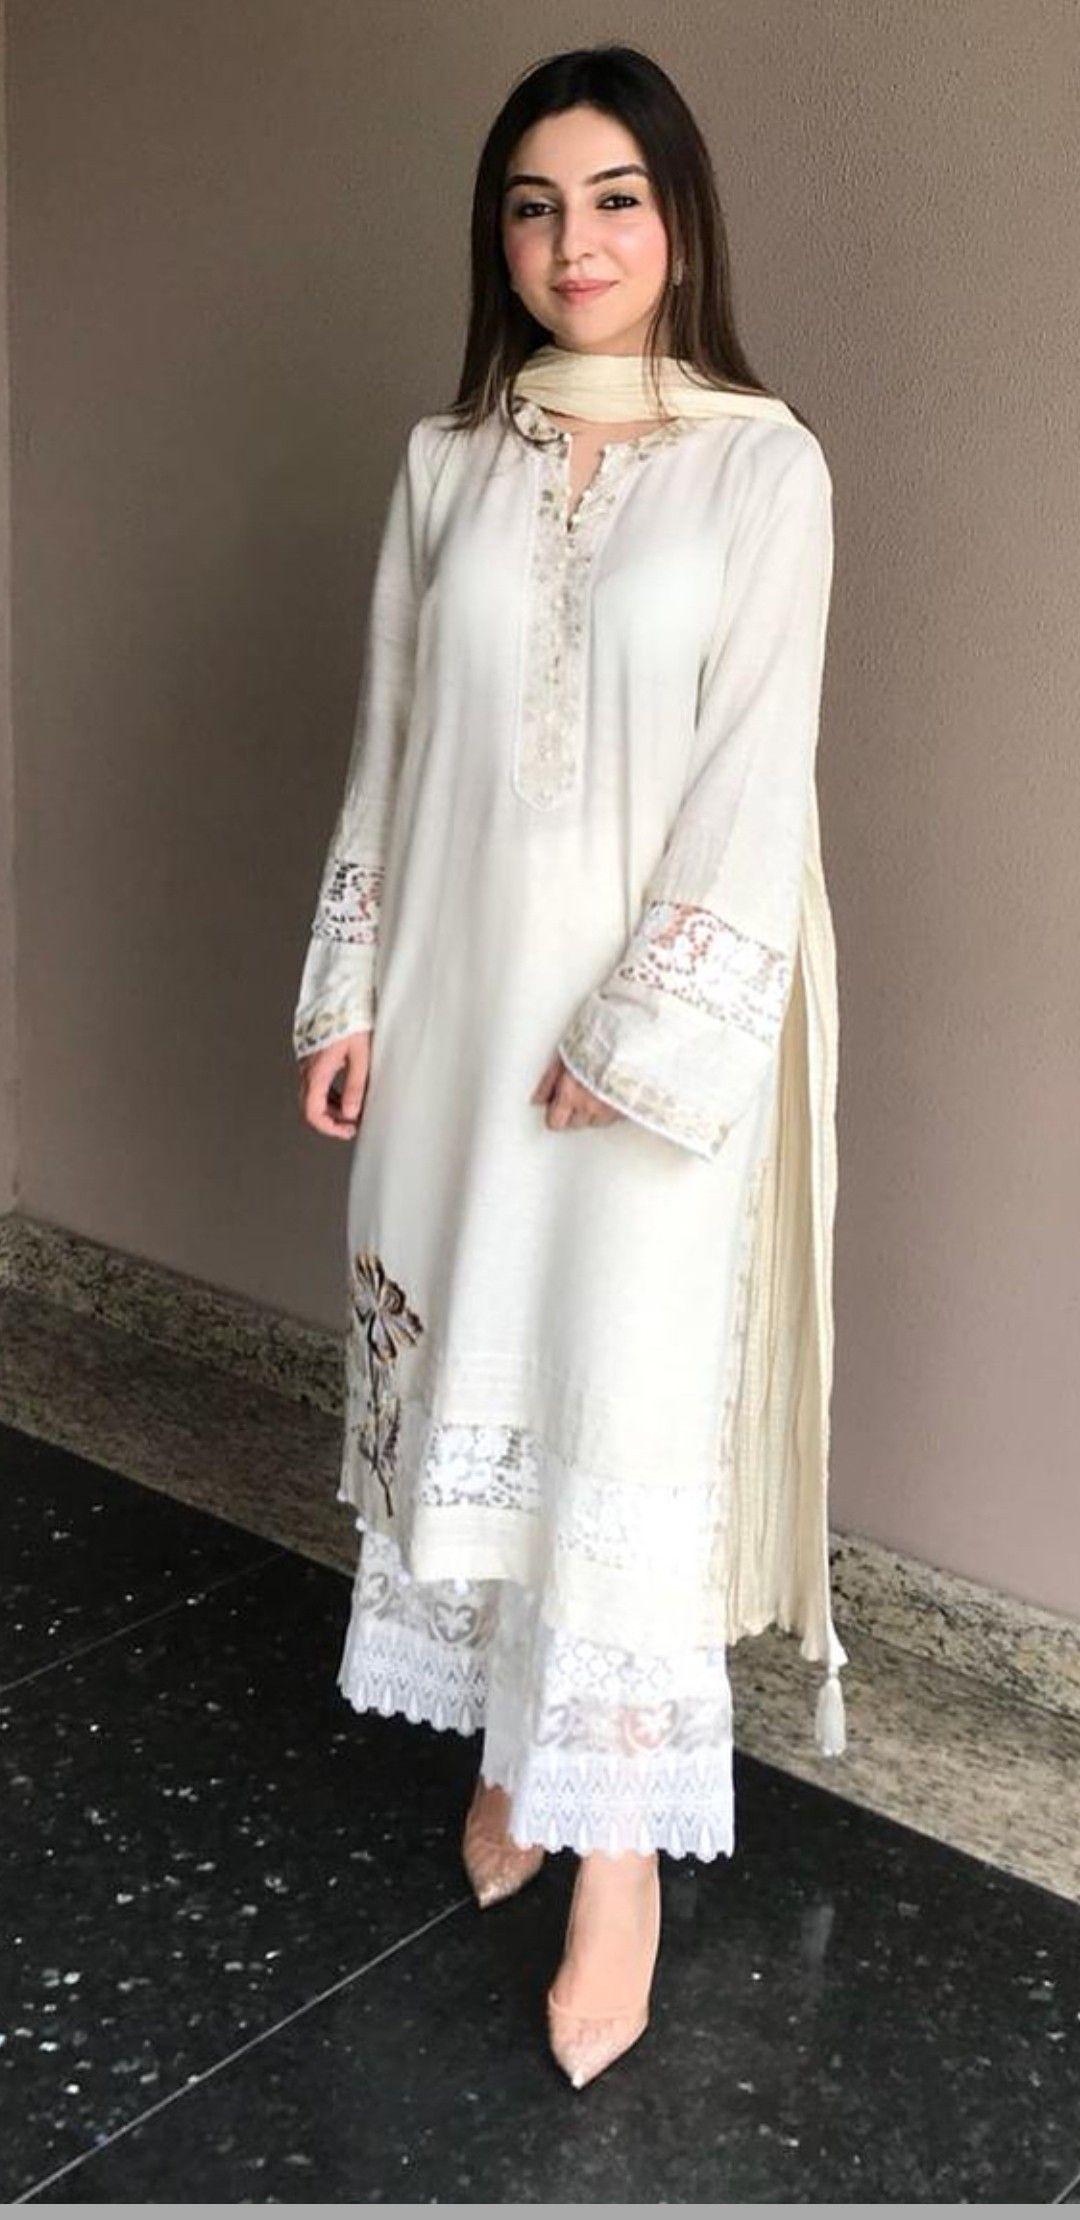 ac106c5dab Pinterest • @KrutiChevli #indianfashion #pakistanifashion #weddings  #weddingideas #lehenga #kundan #kurti #suits #chaniyacholi #dresses #saree